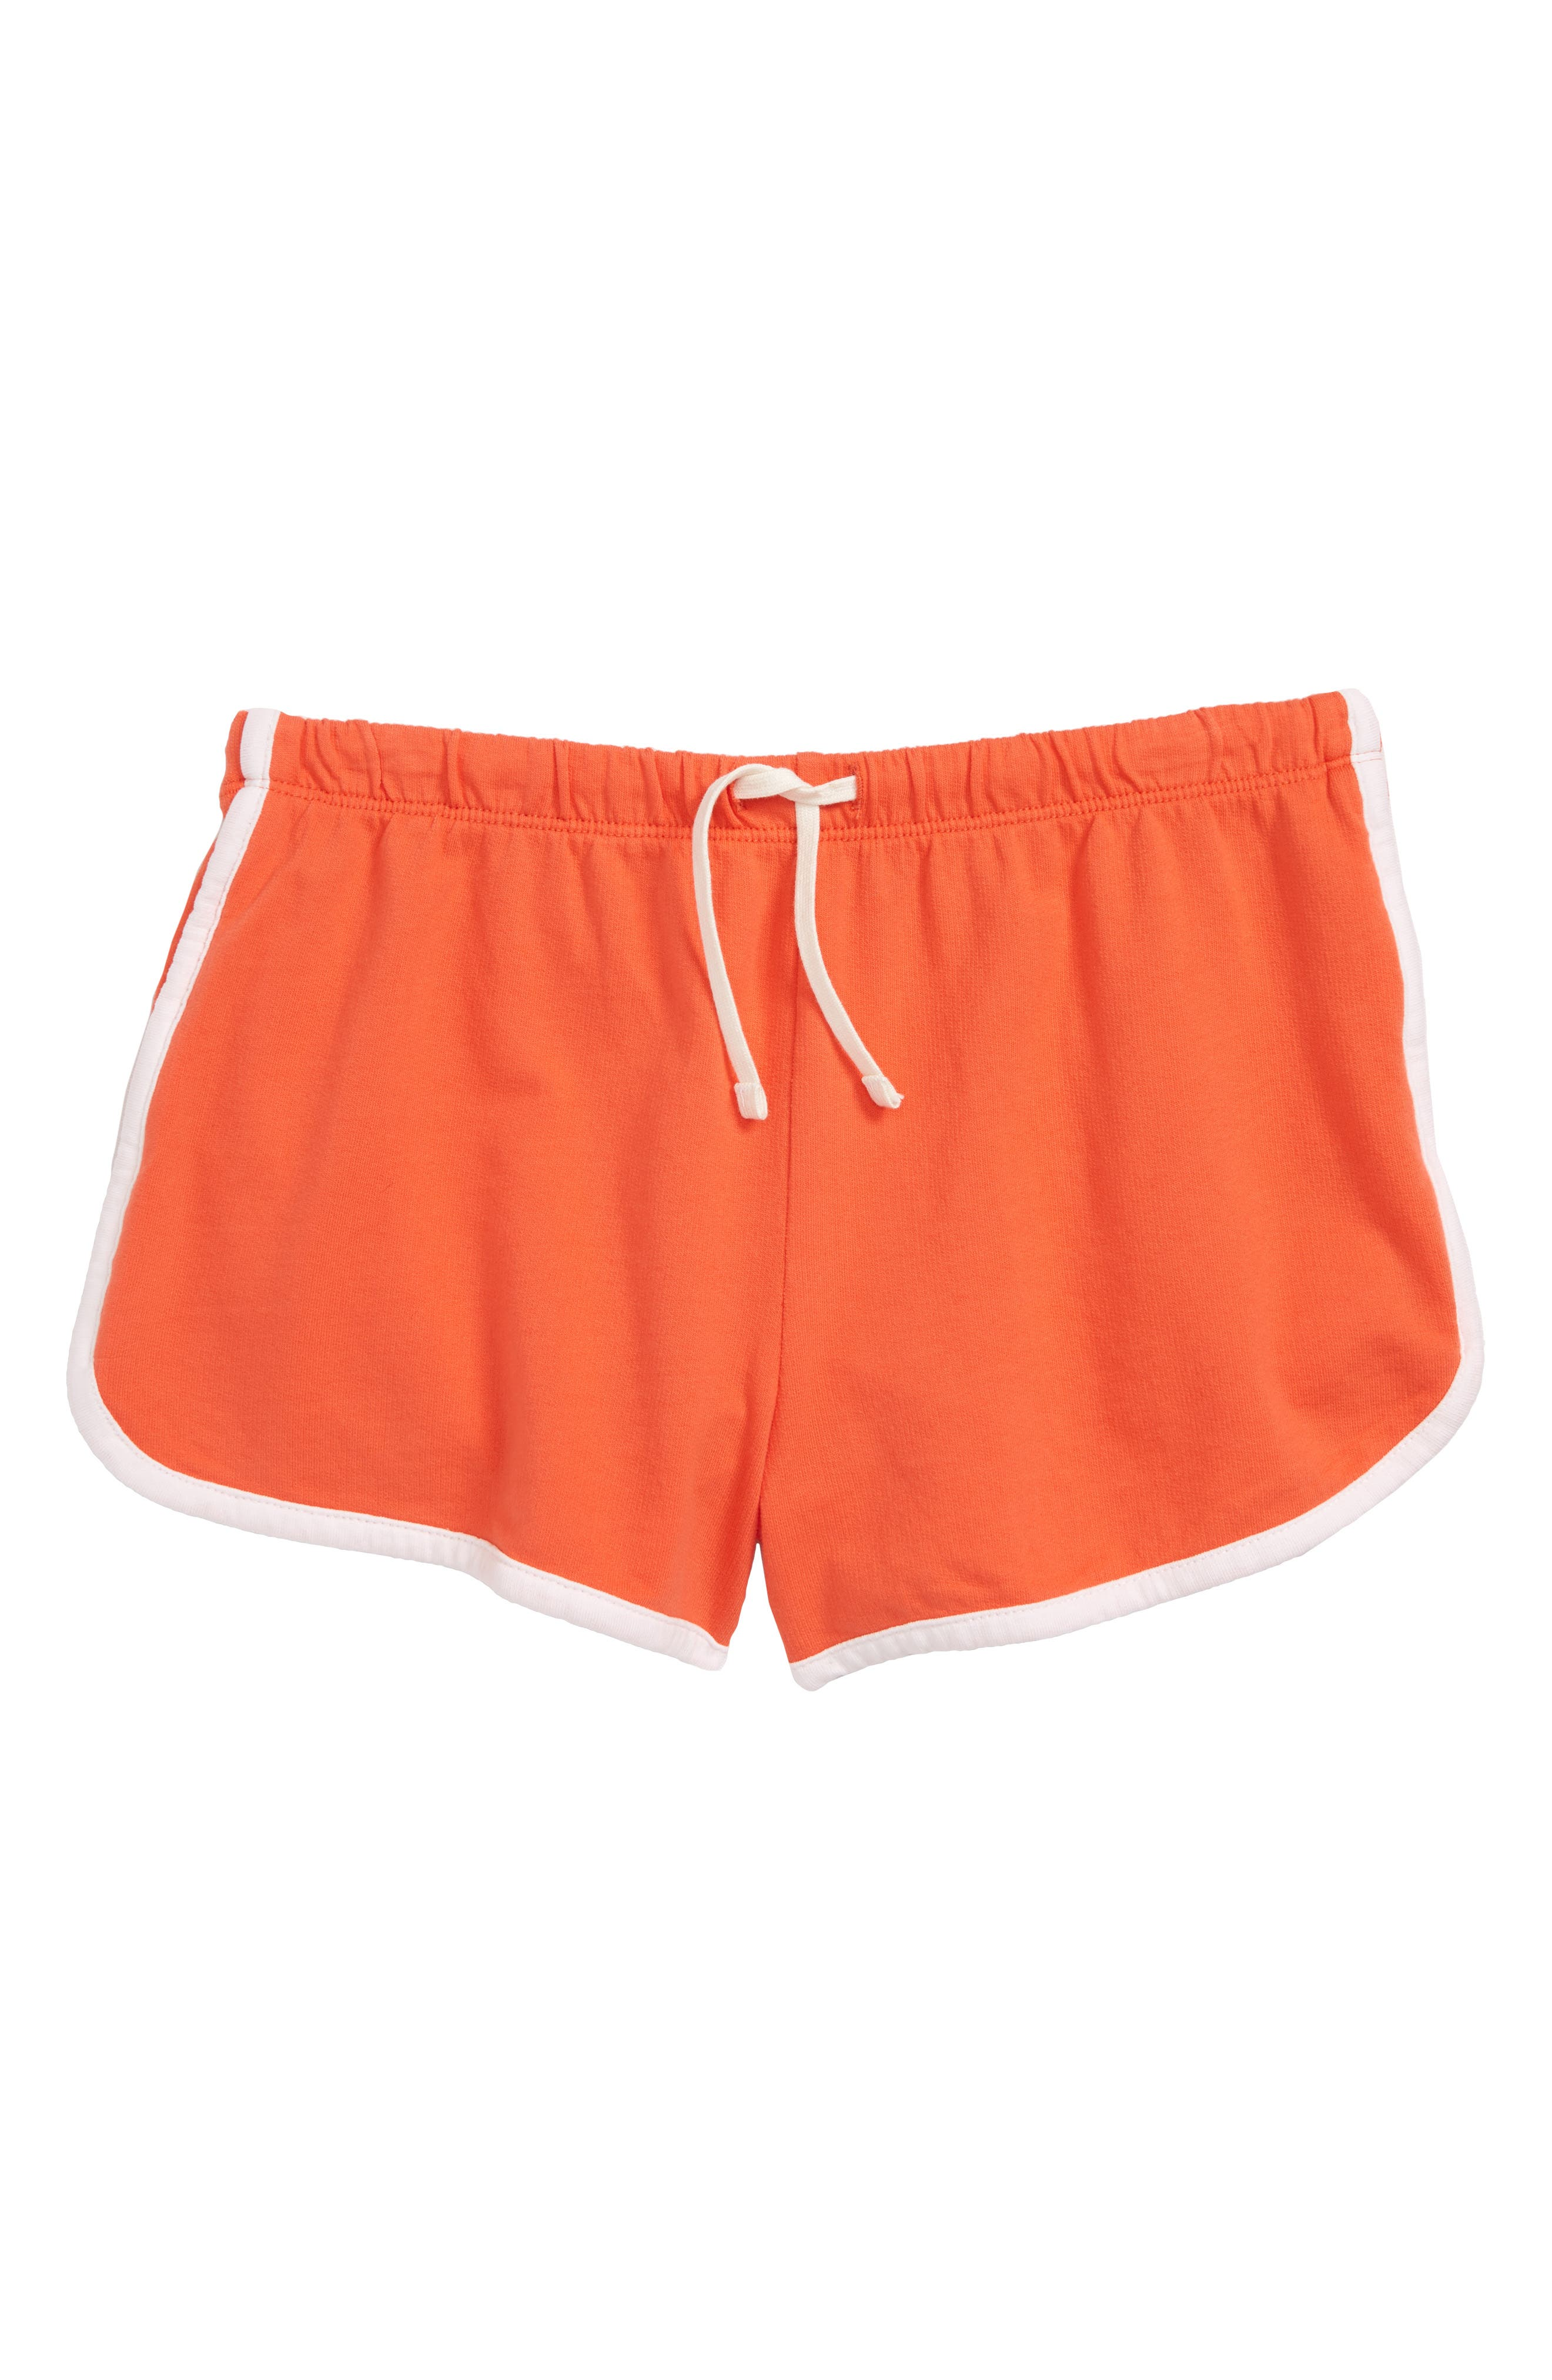 Tucker + Tate Cotton Dolphin Shorts (Big Girls)